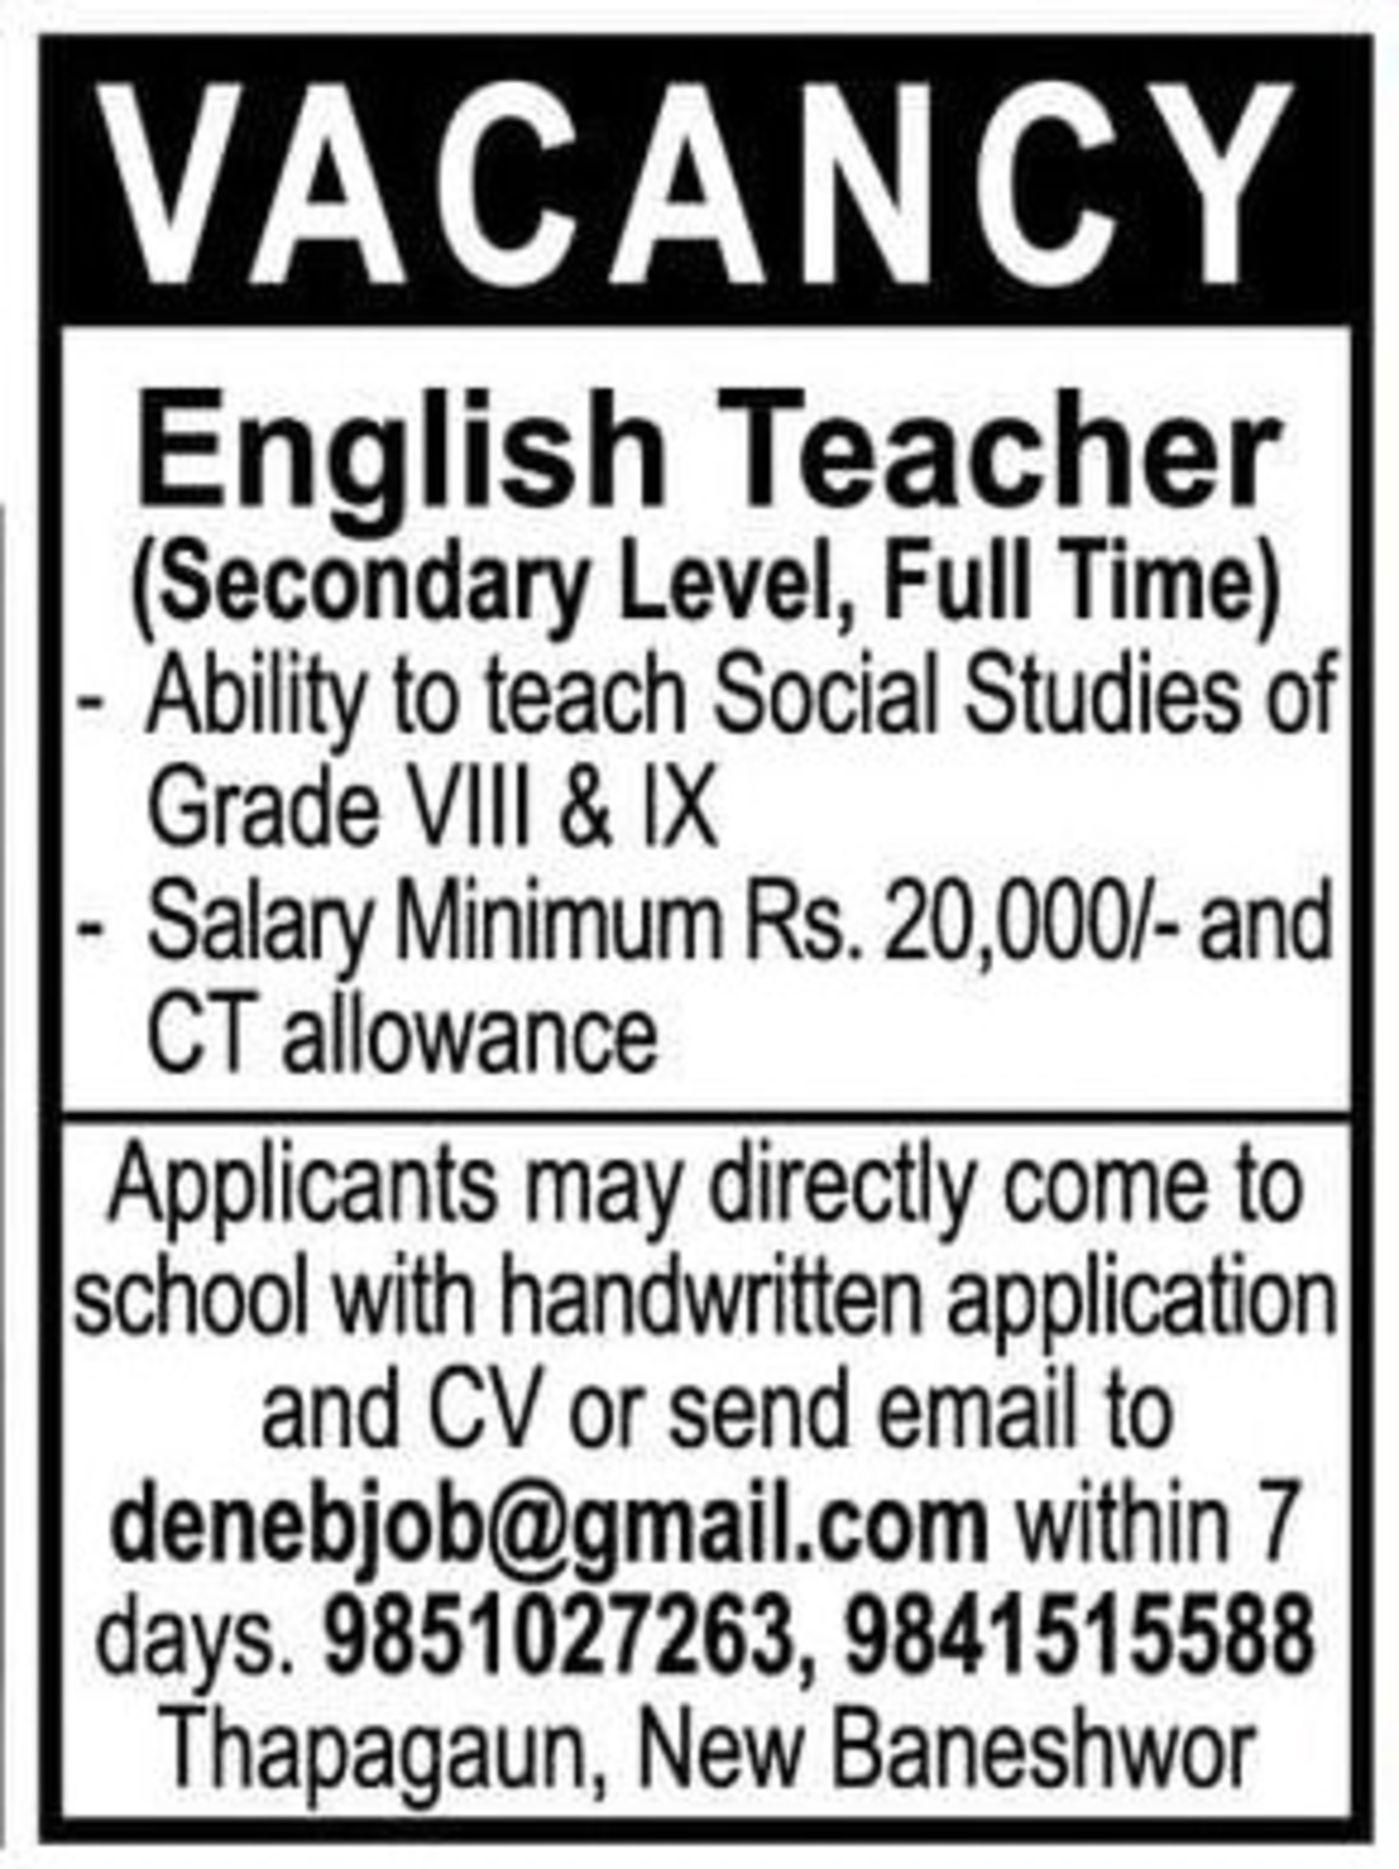 Jobs Nepal - Vacancy - English Teacher - ( Domestic Jobs )